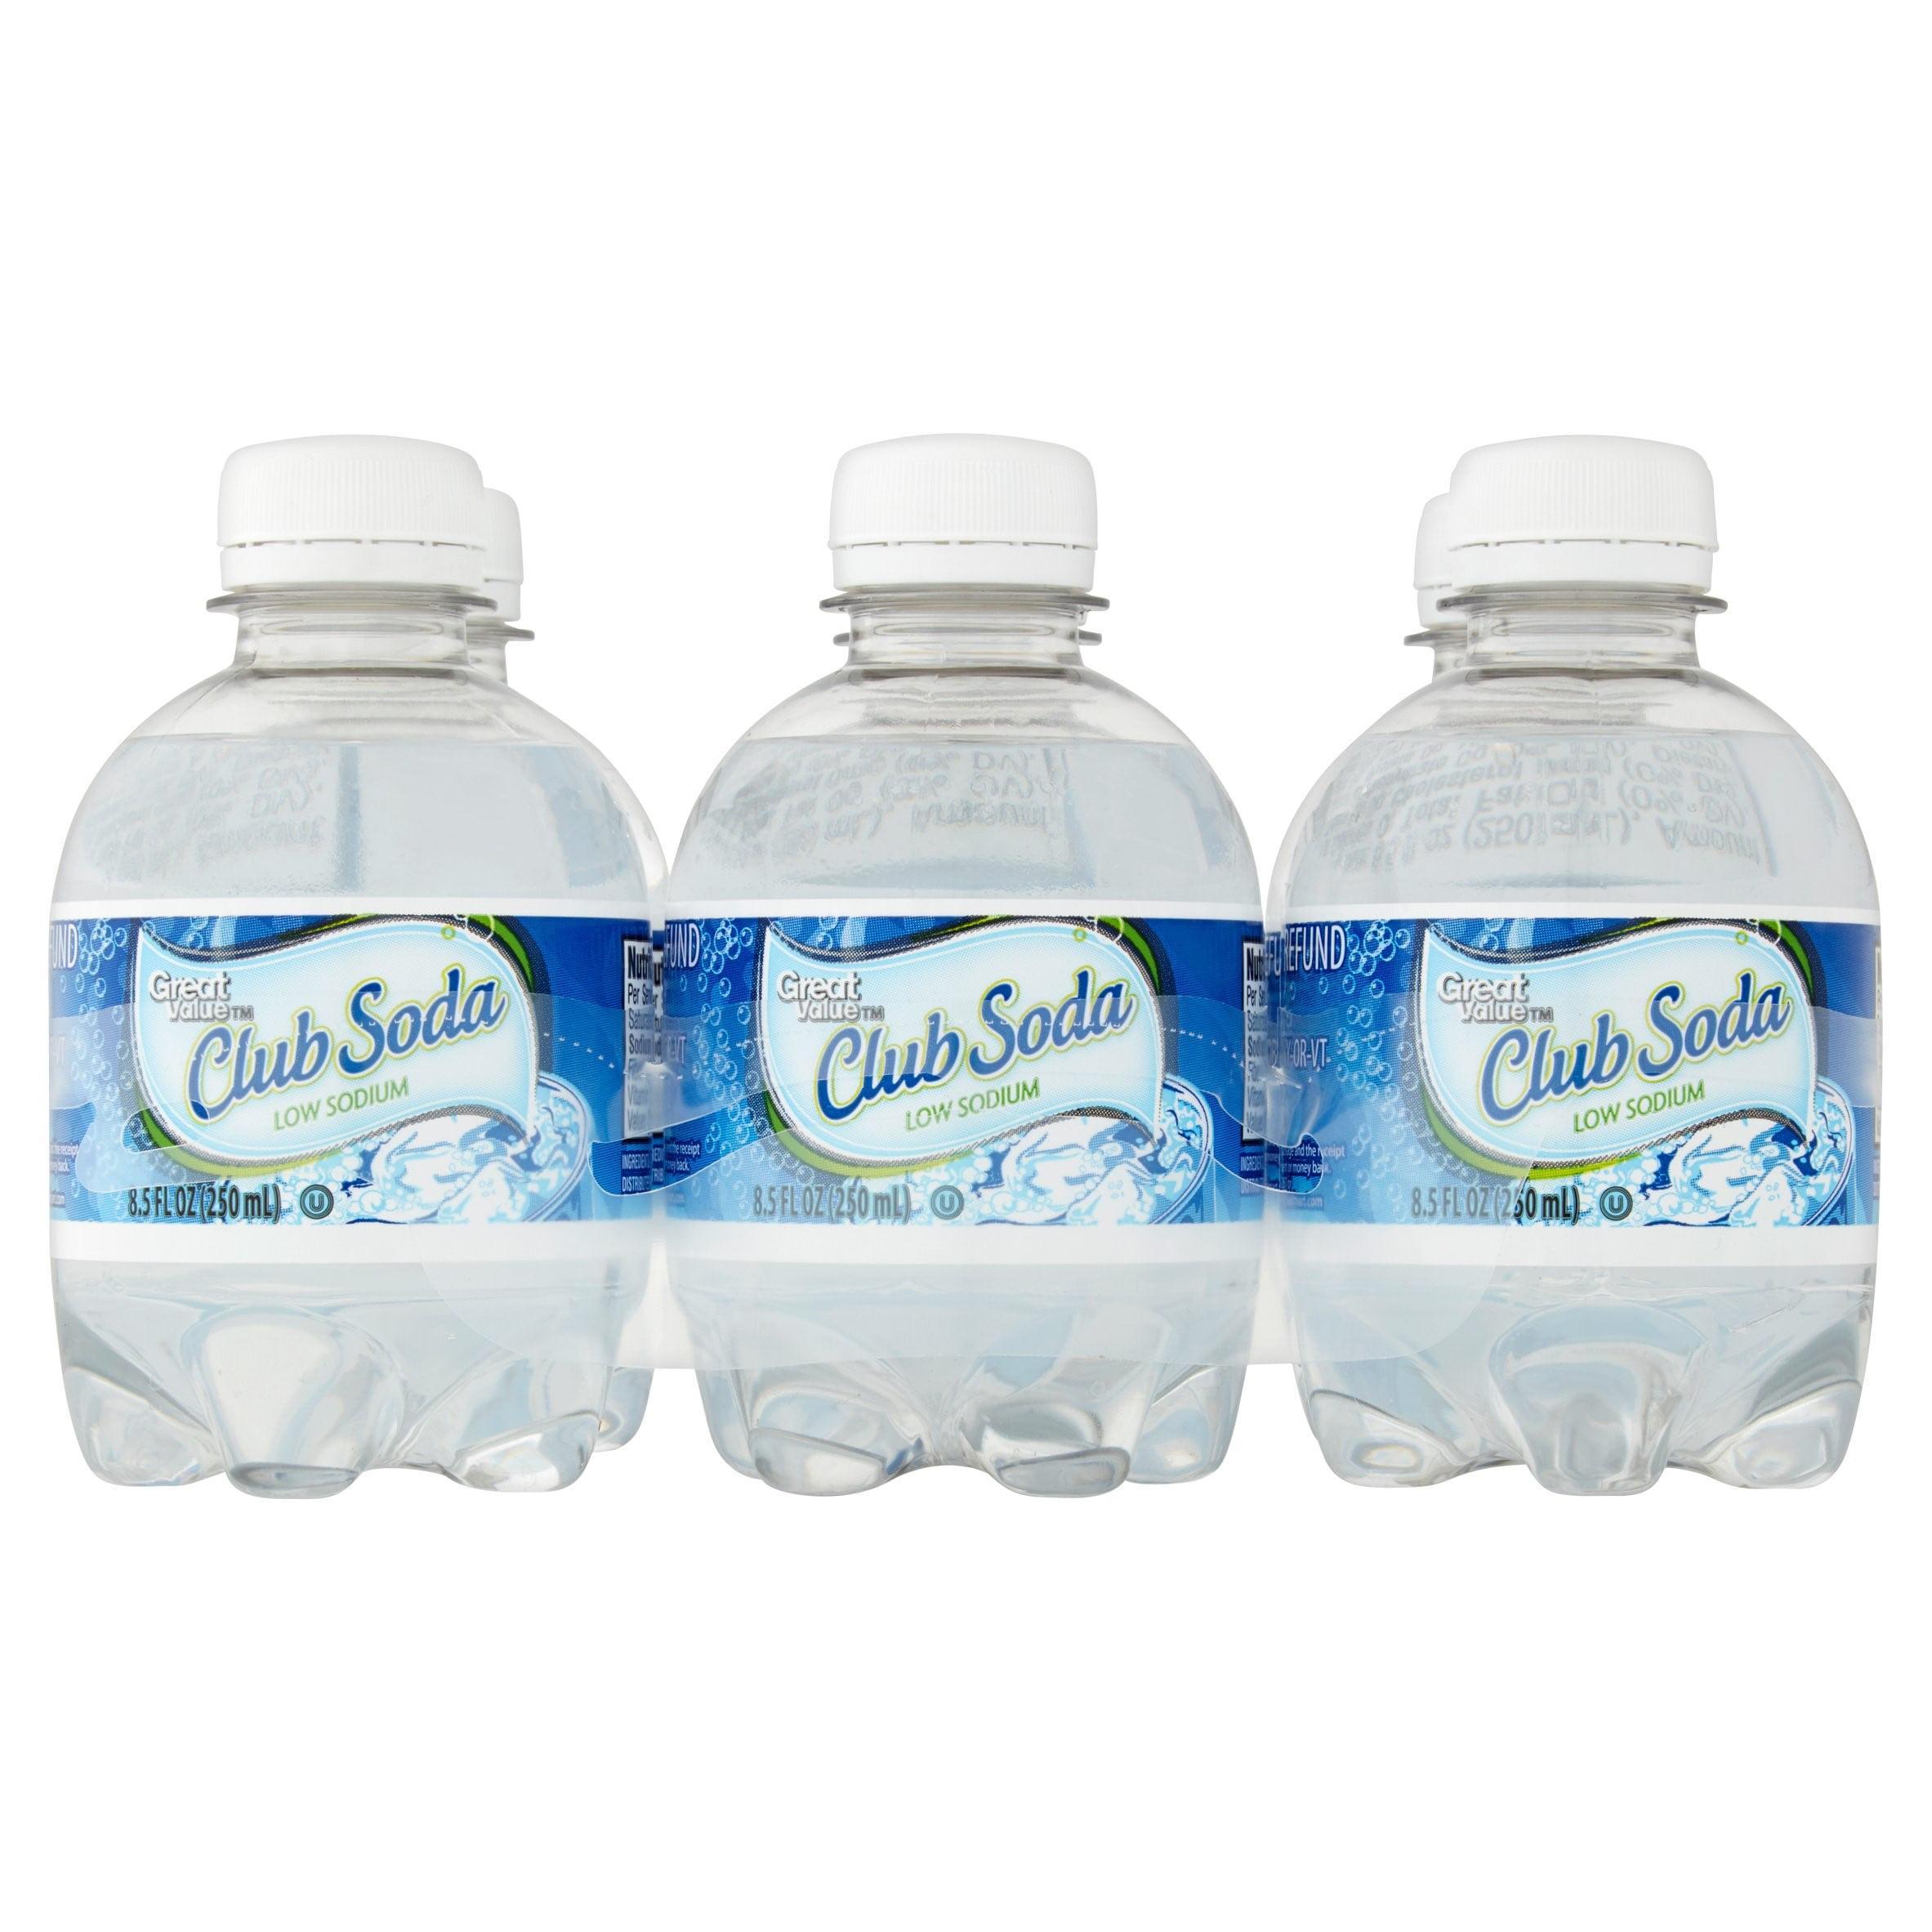 Great Value Club Soda Beverage, 8.5 fl oz, 6 pack - Walmart.com